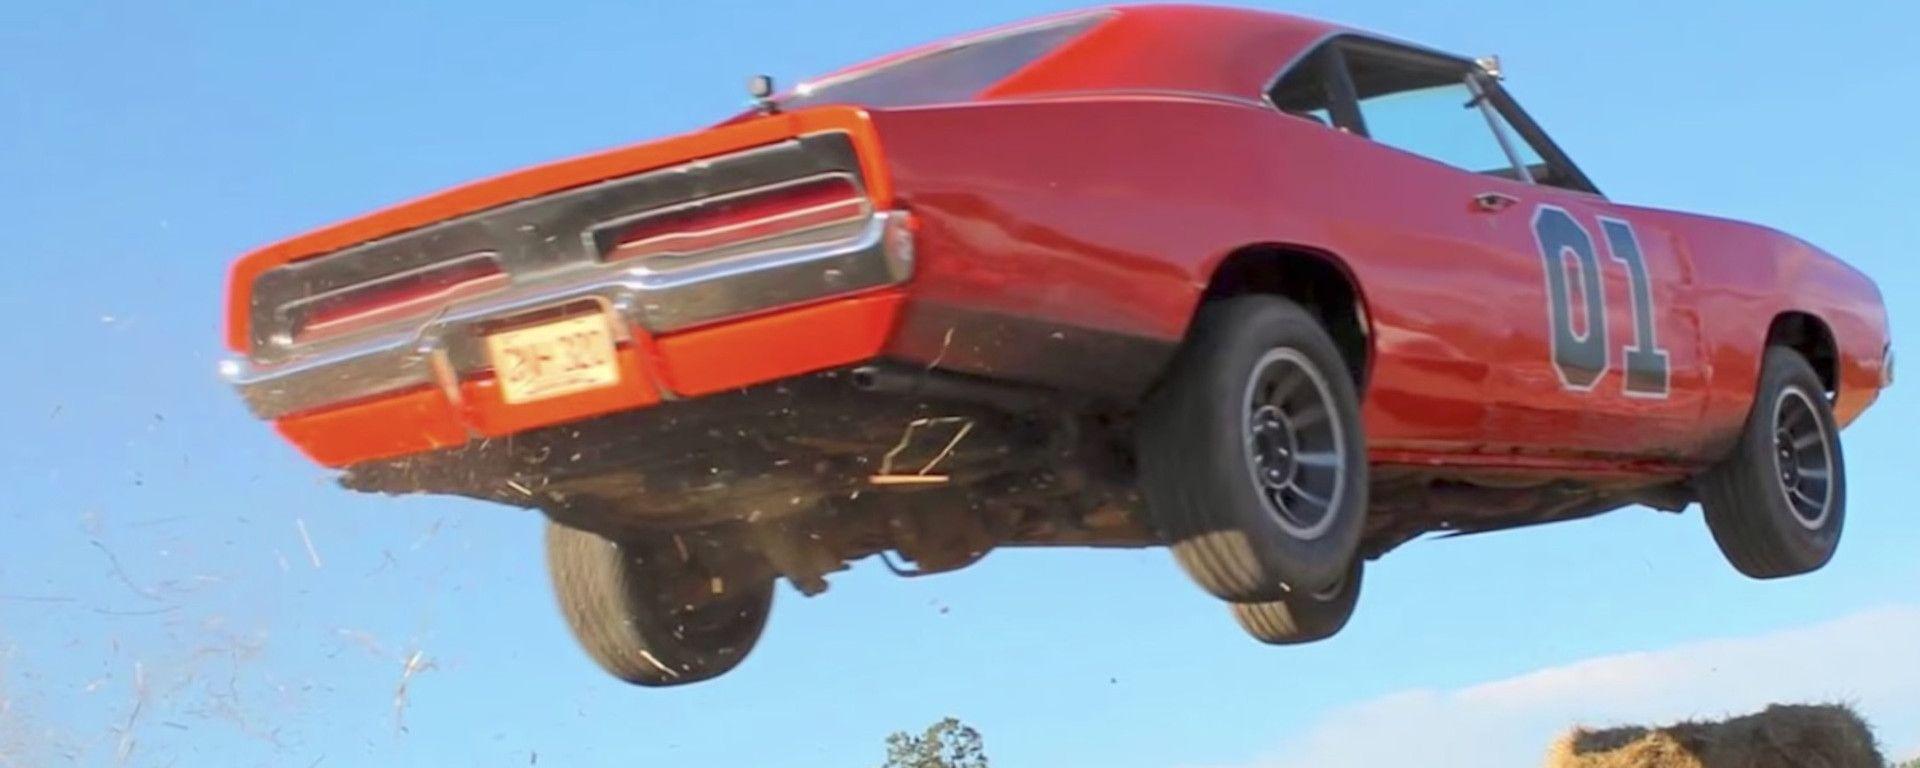 La Dodge Charger Generale Lee del film Hazzard